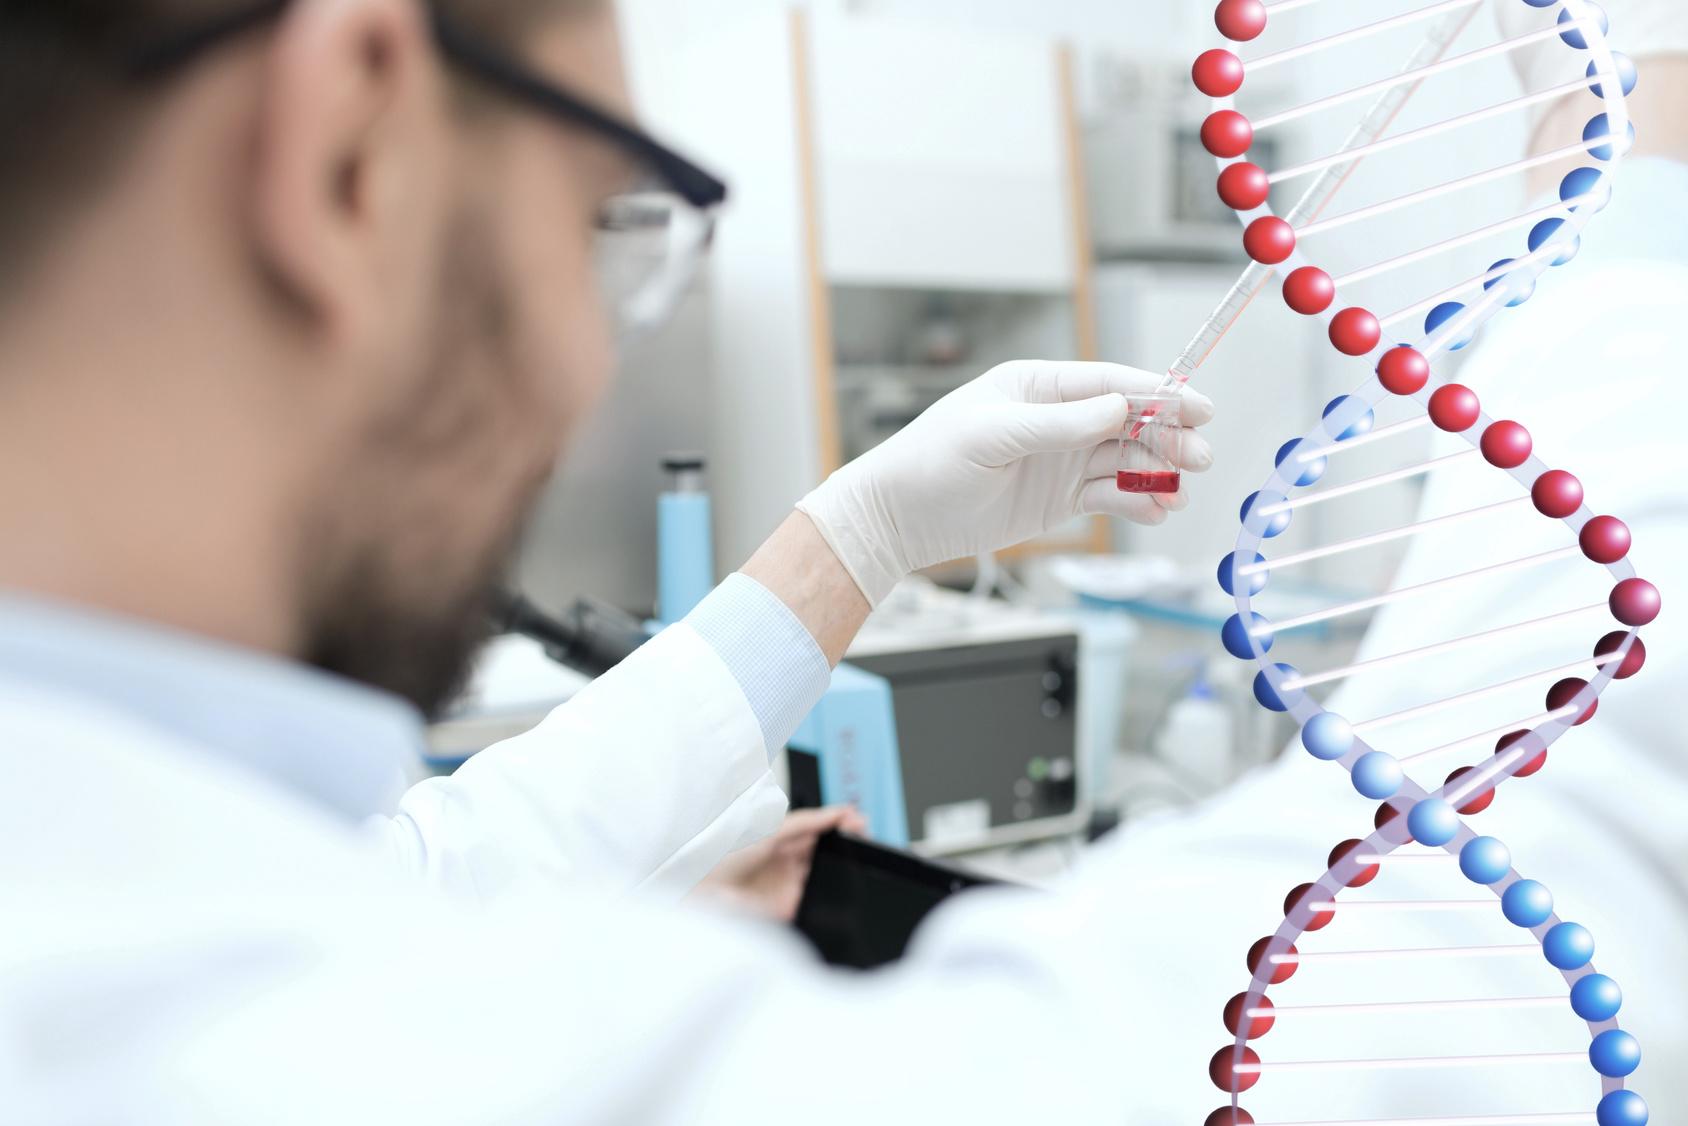 Chemie Physik Biologie Die 5 Besten Jobs Heimarbeit De